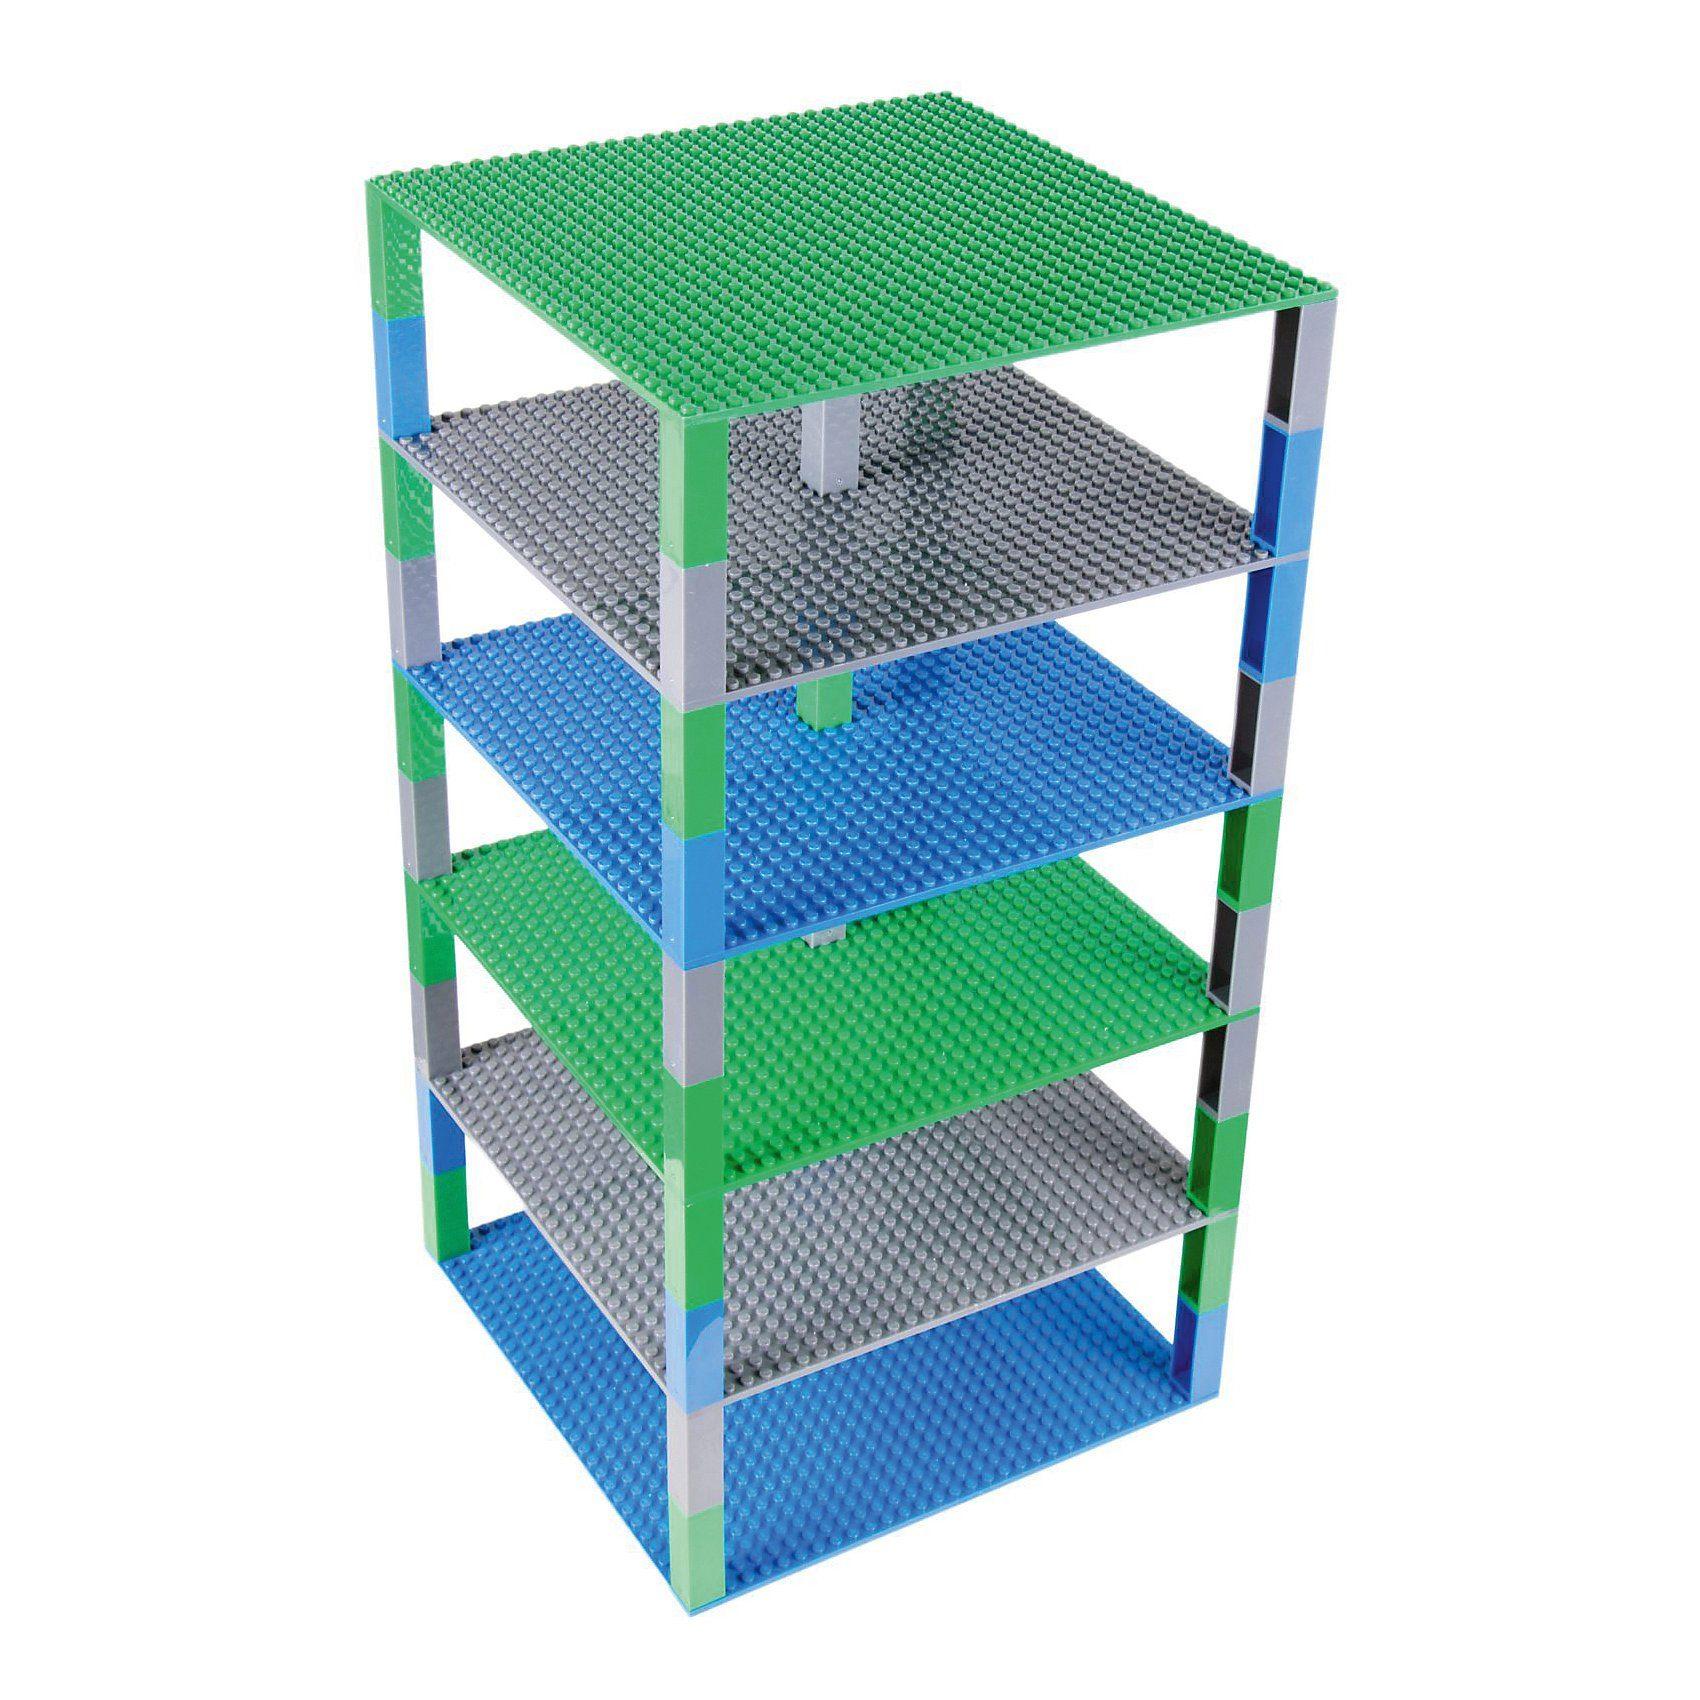 BRIK Tower 6 Floors 32x32 Studs Blau, Grün, Dunkel Grau mit